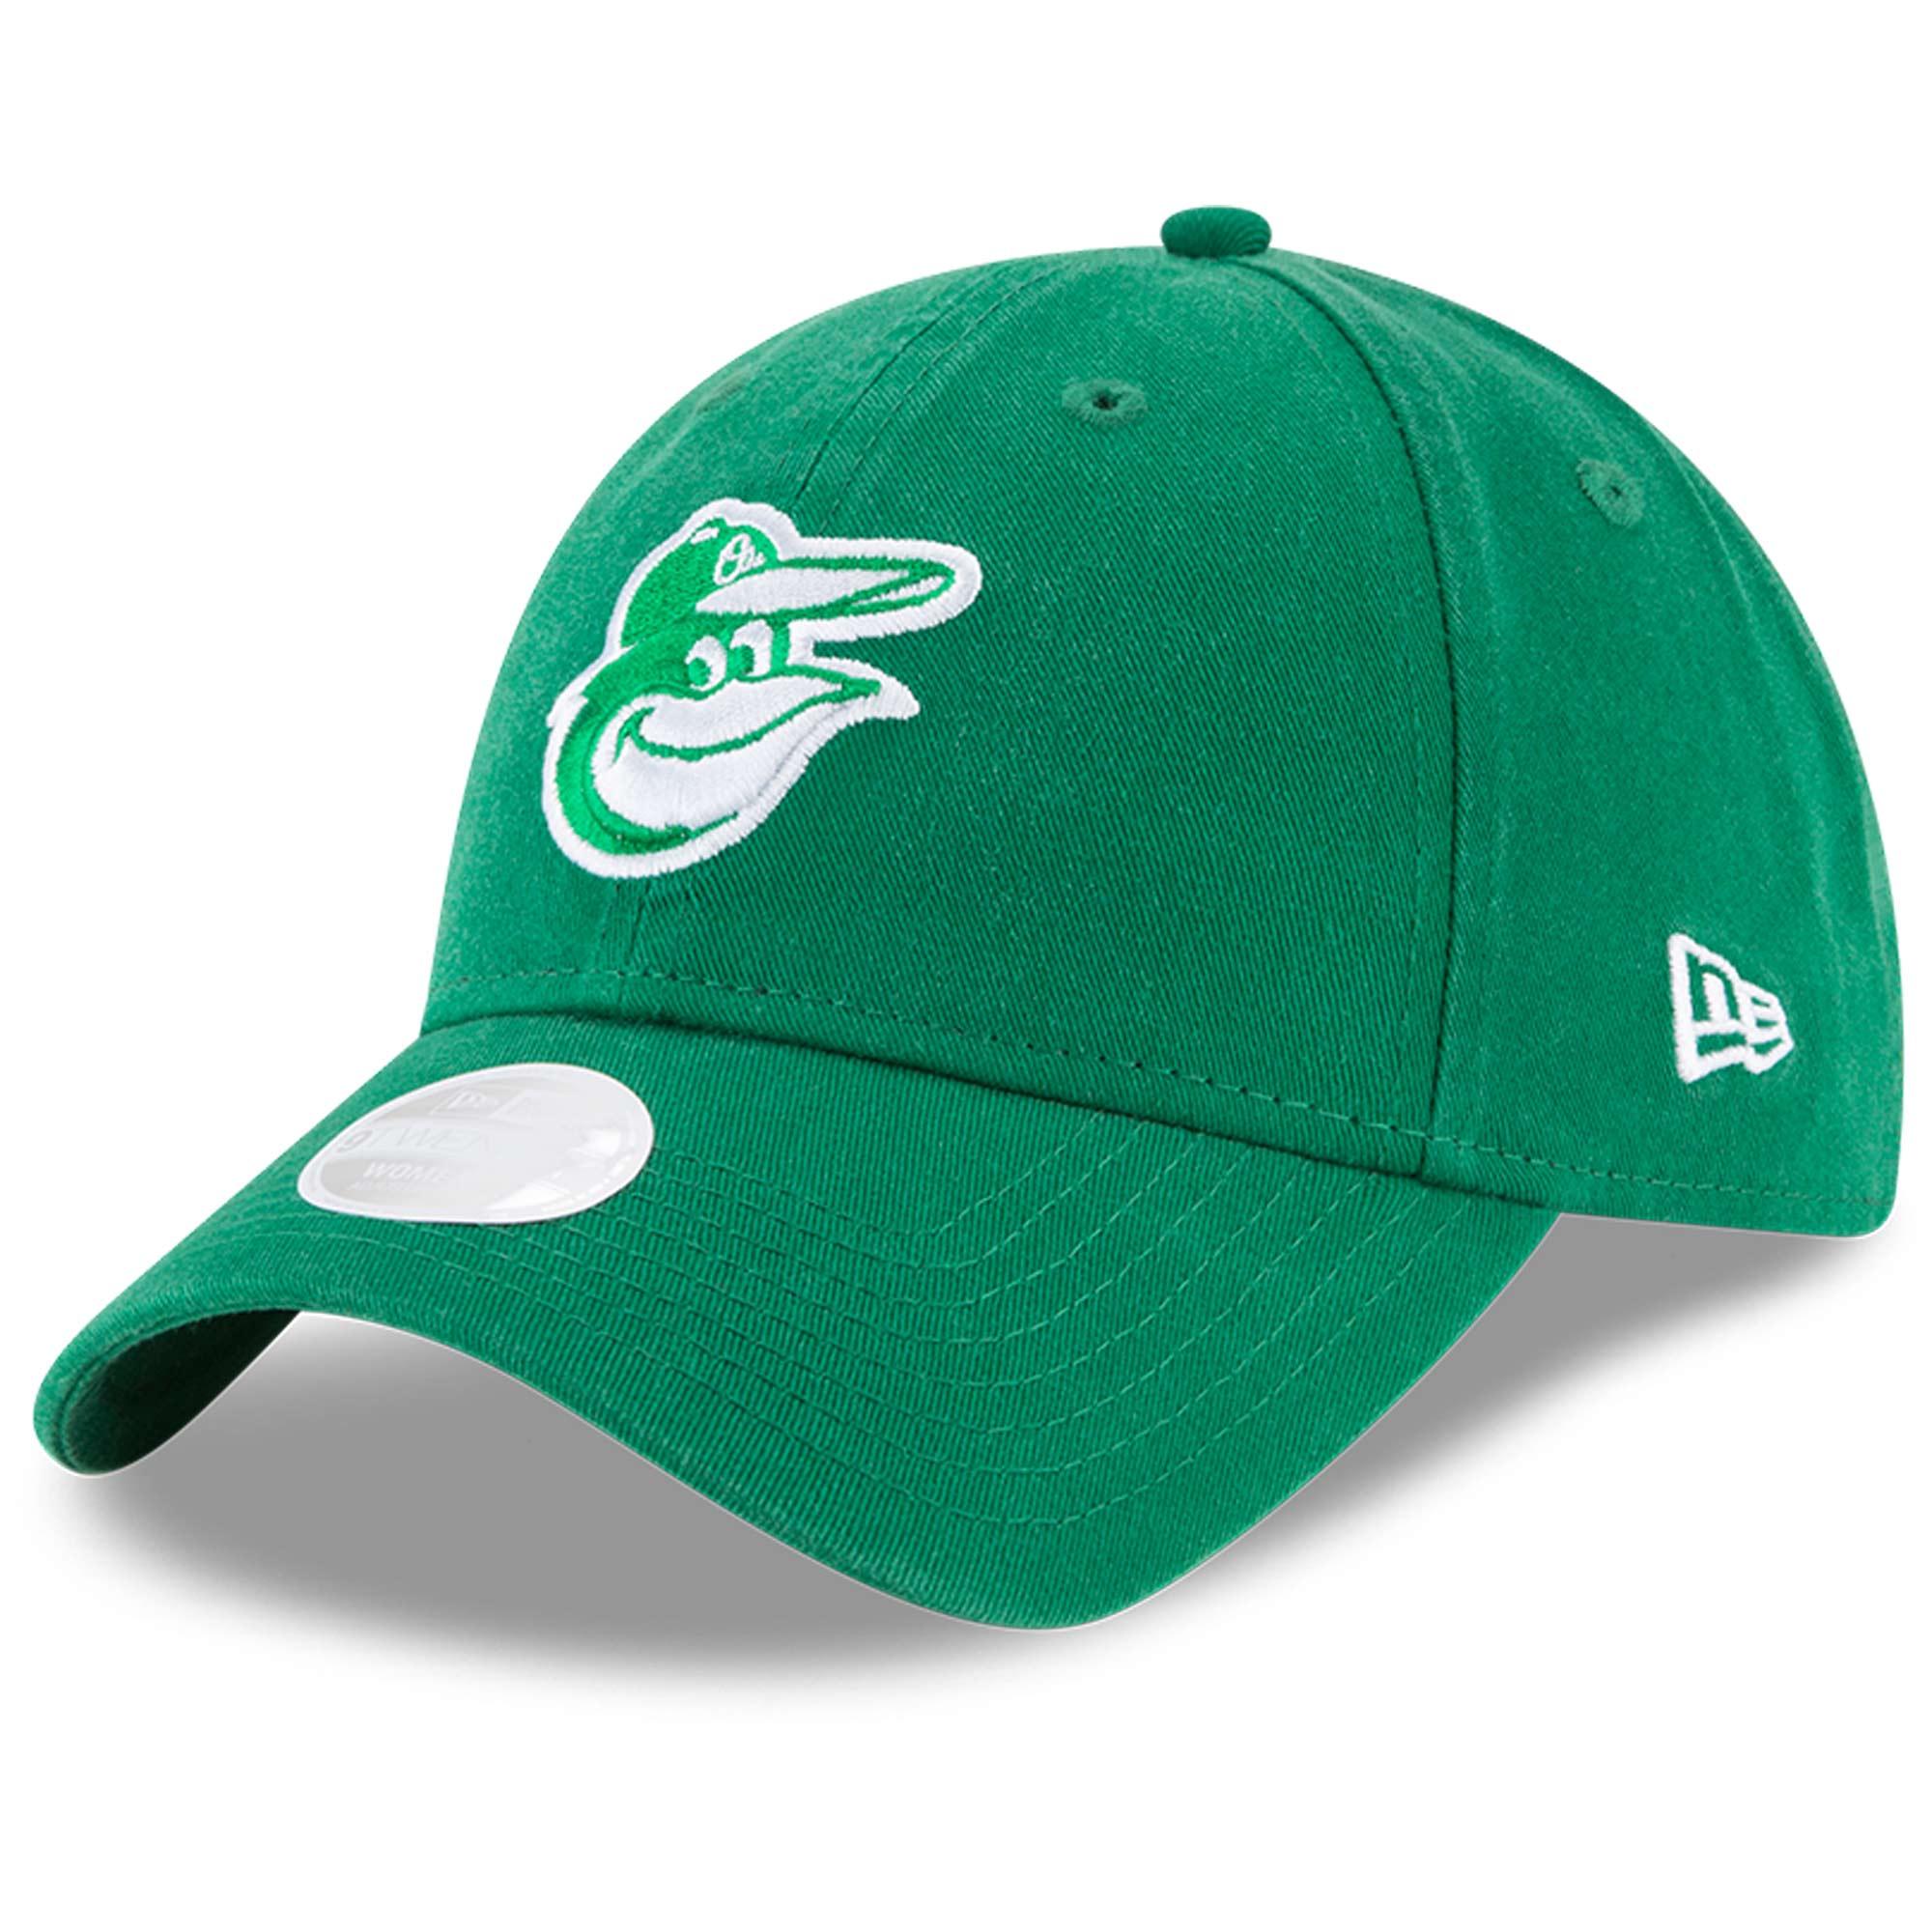 Baltimore Orioles New Era Women's Core Classic Twill St. Patrick's Day 9TWENTY Adjustable Hat - Green - OSFA